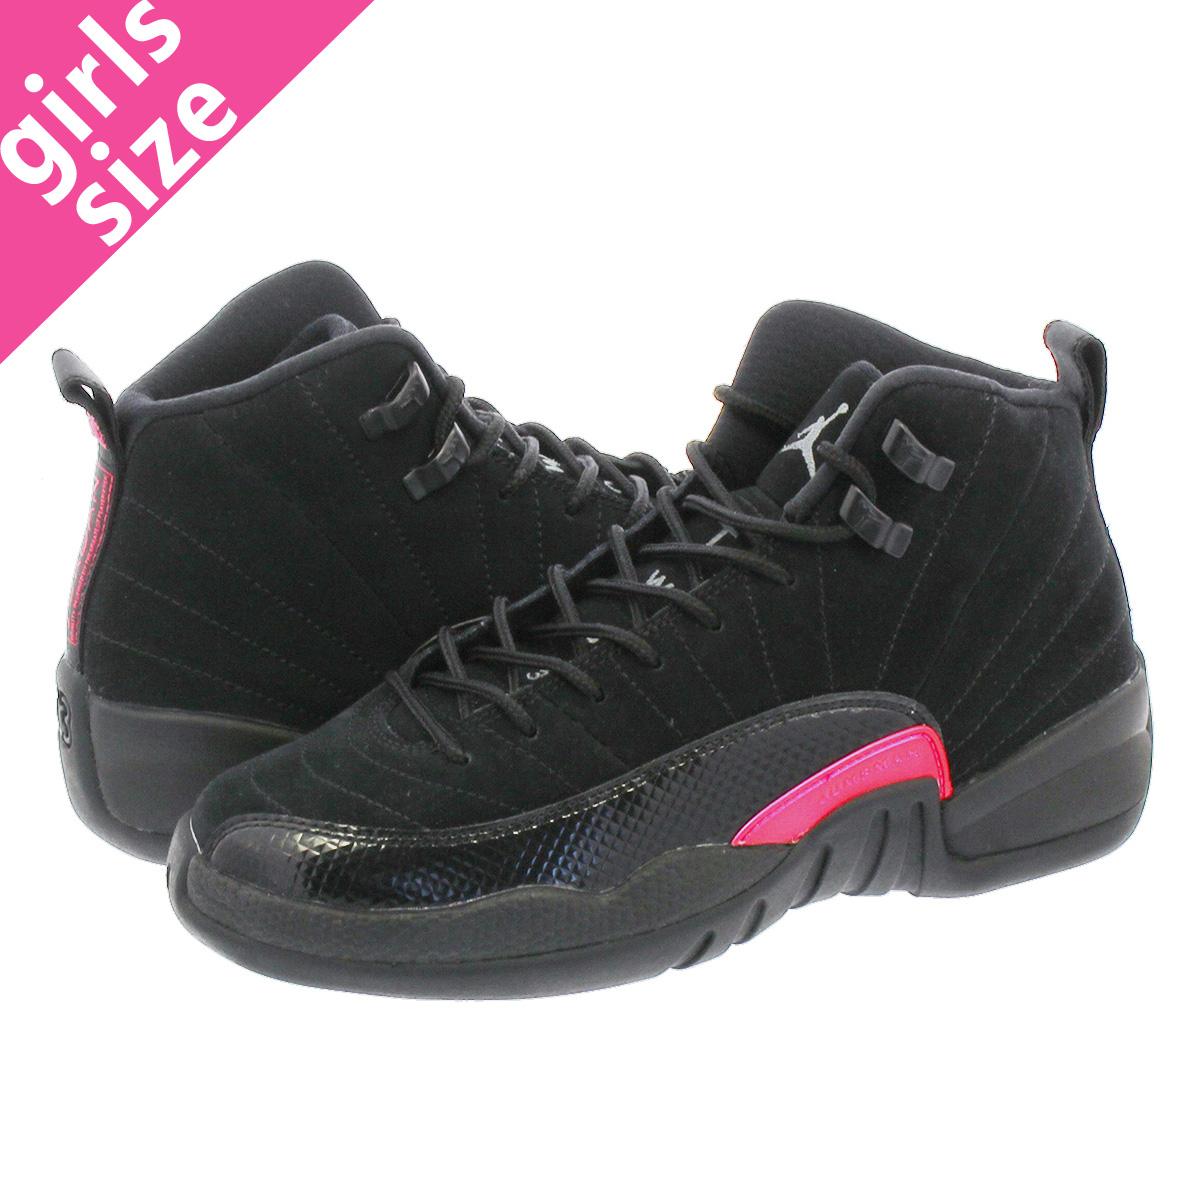 huge discount 7a961 70f17 NIKE AIR JORDAN 12 RETRO GG Nike Air Jordan 12 nostalgic GG BLACK DARK  GREY RUSH PINK 510,815-006